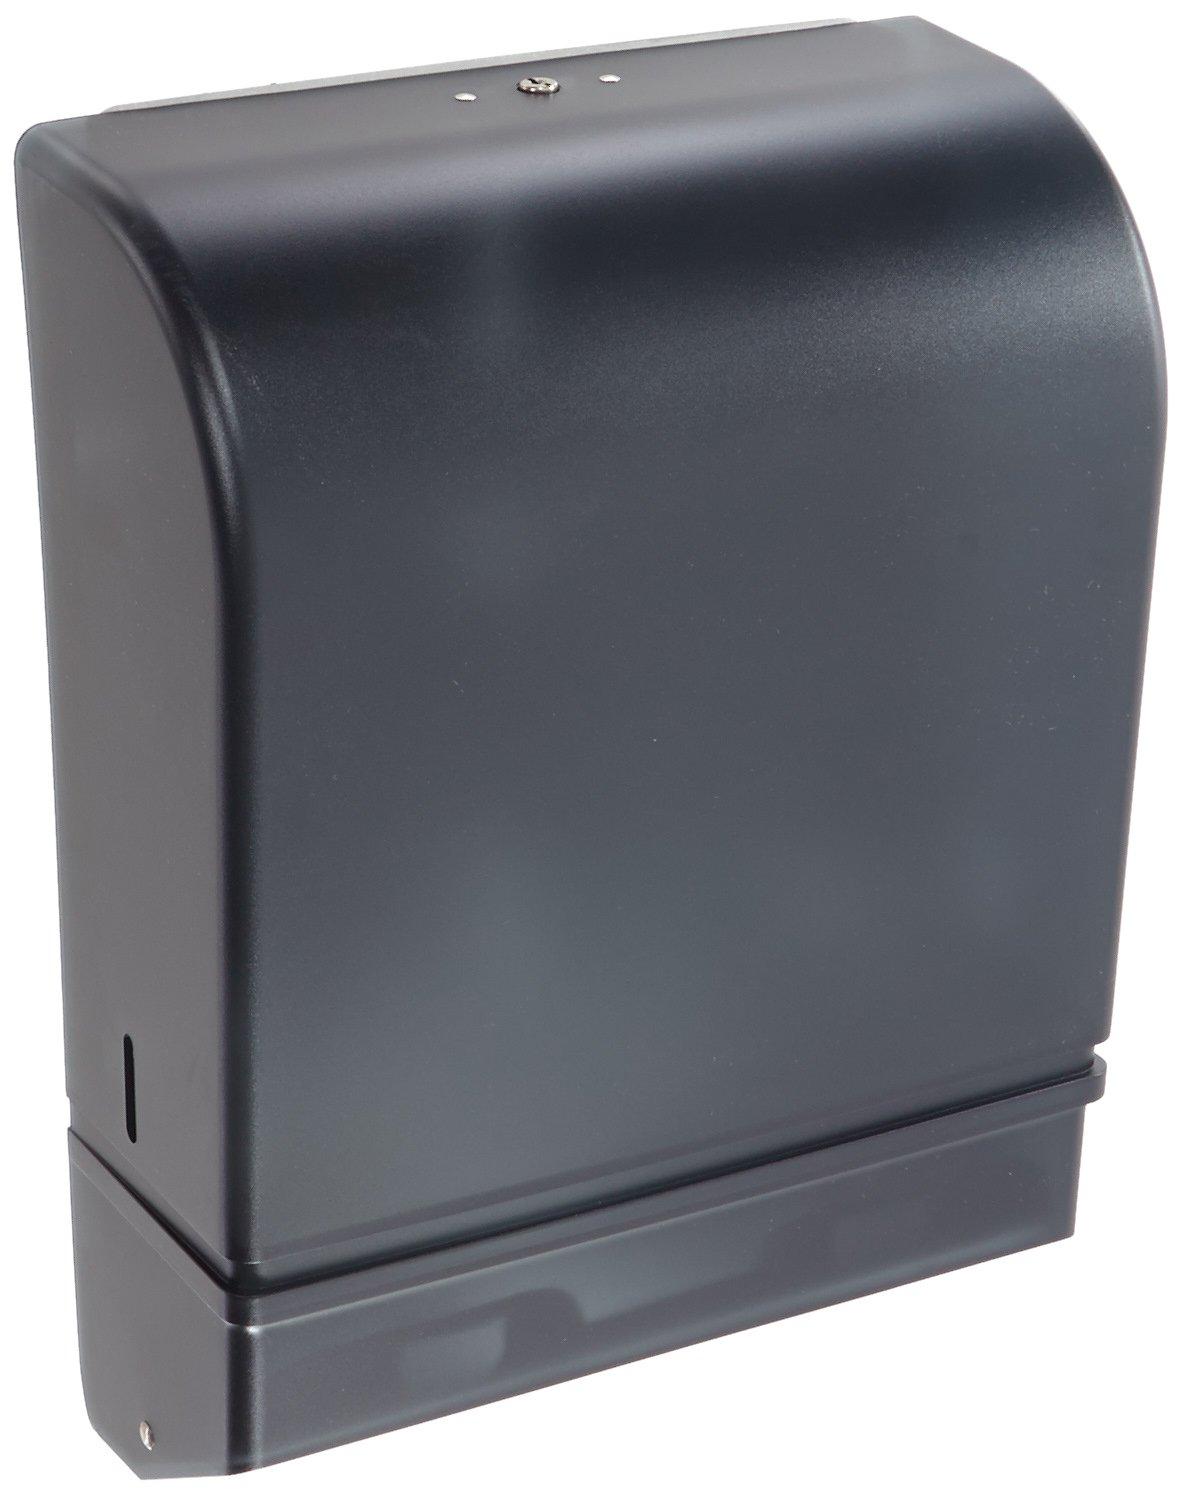 Impact 4089 ClearVu Combo Towel Dispenser, 15-3/4'' Length x 10-1/2'' Width x 8-3/4'' Height, Smoke (Case of 6)